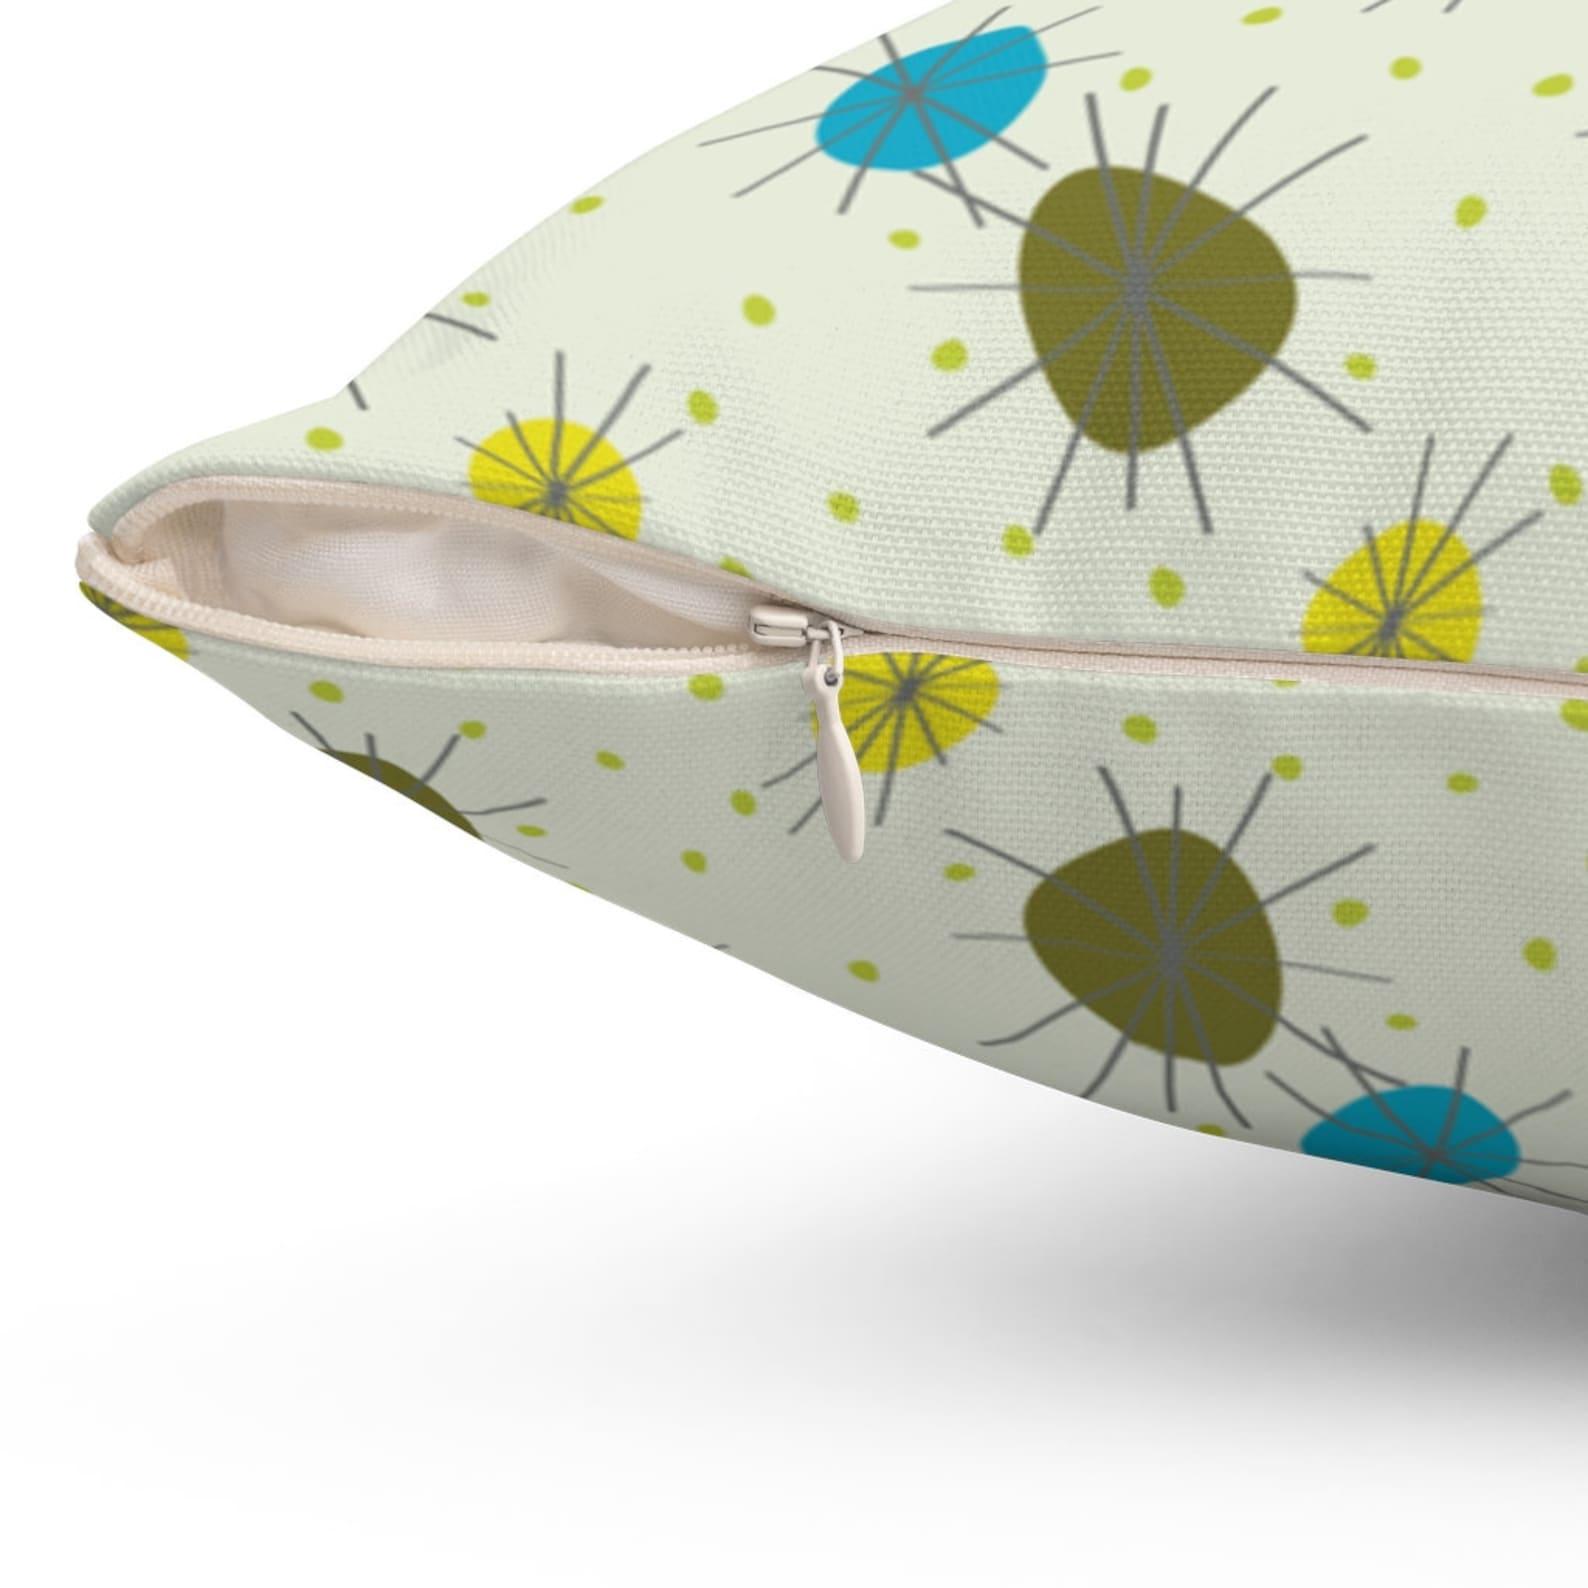 midcentury modern throw pillow atomic starburst retro  etsy